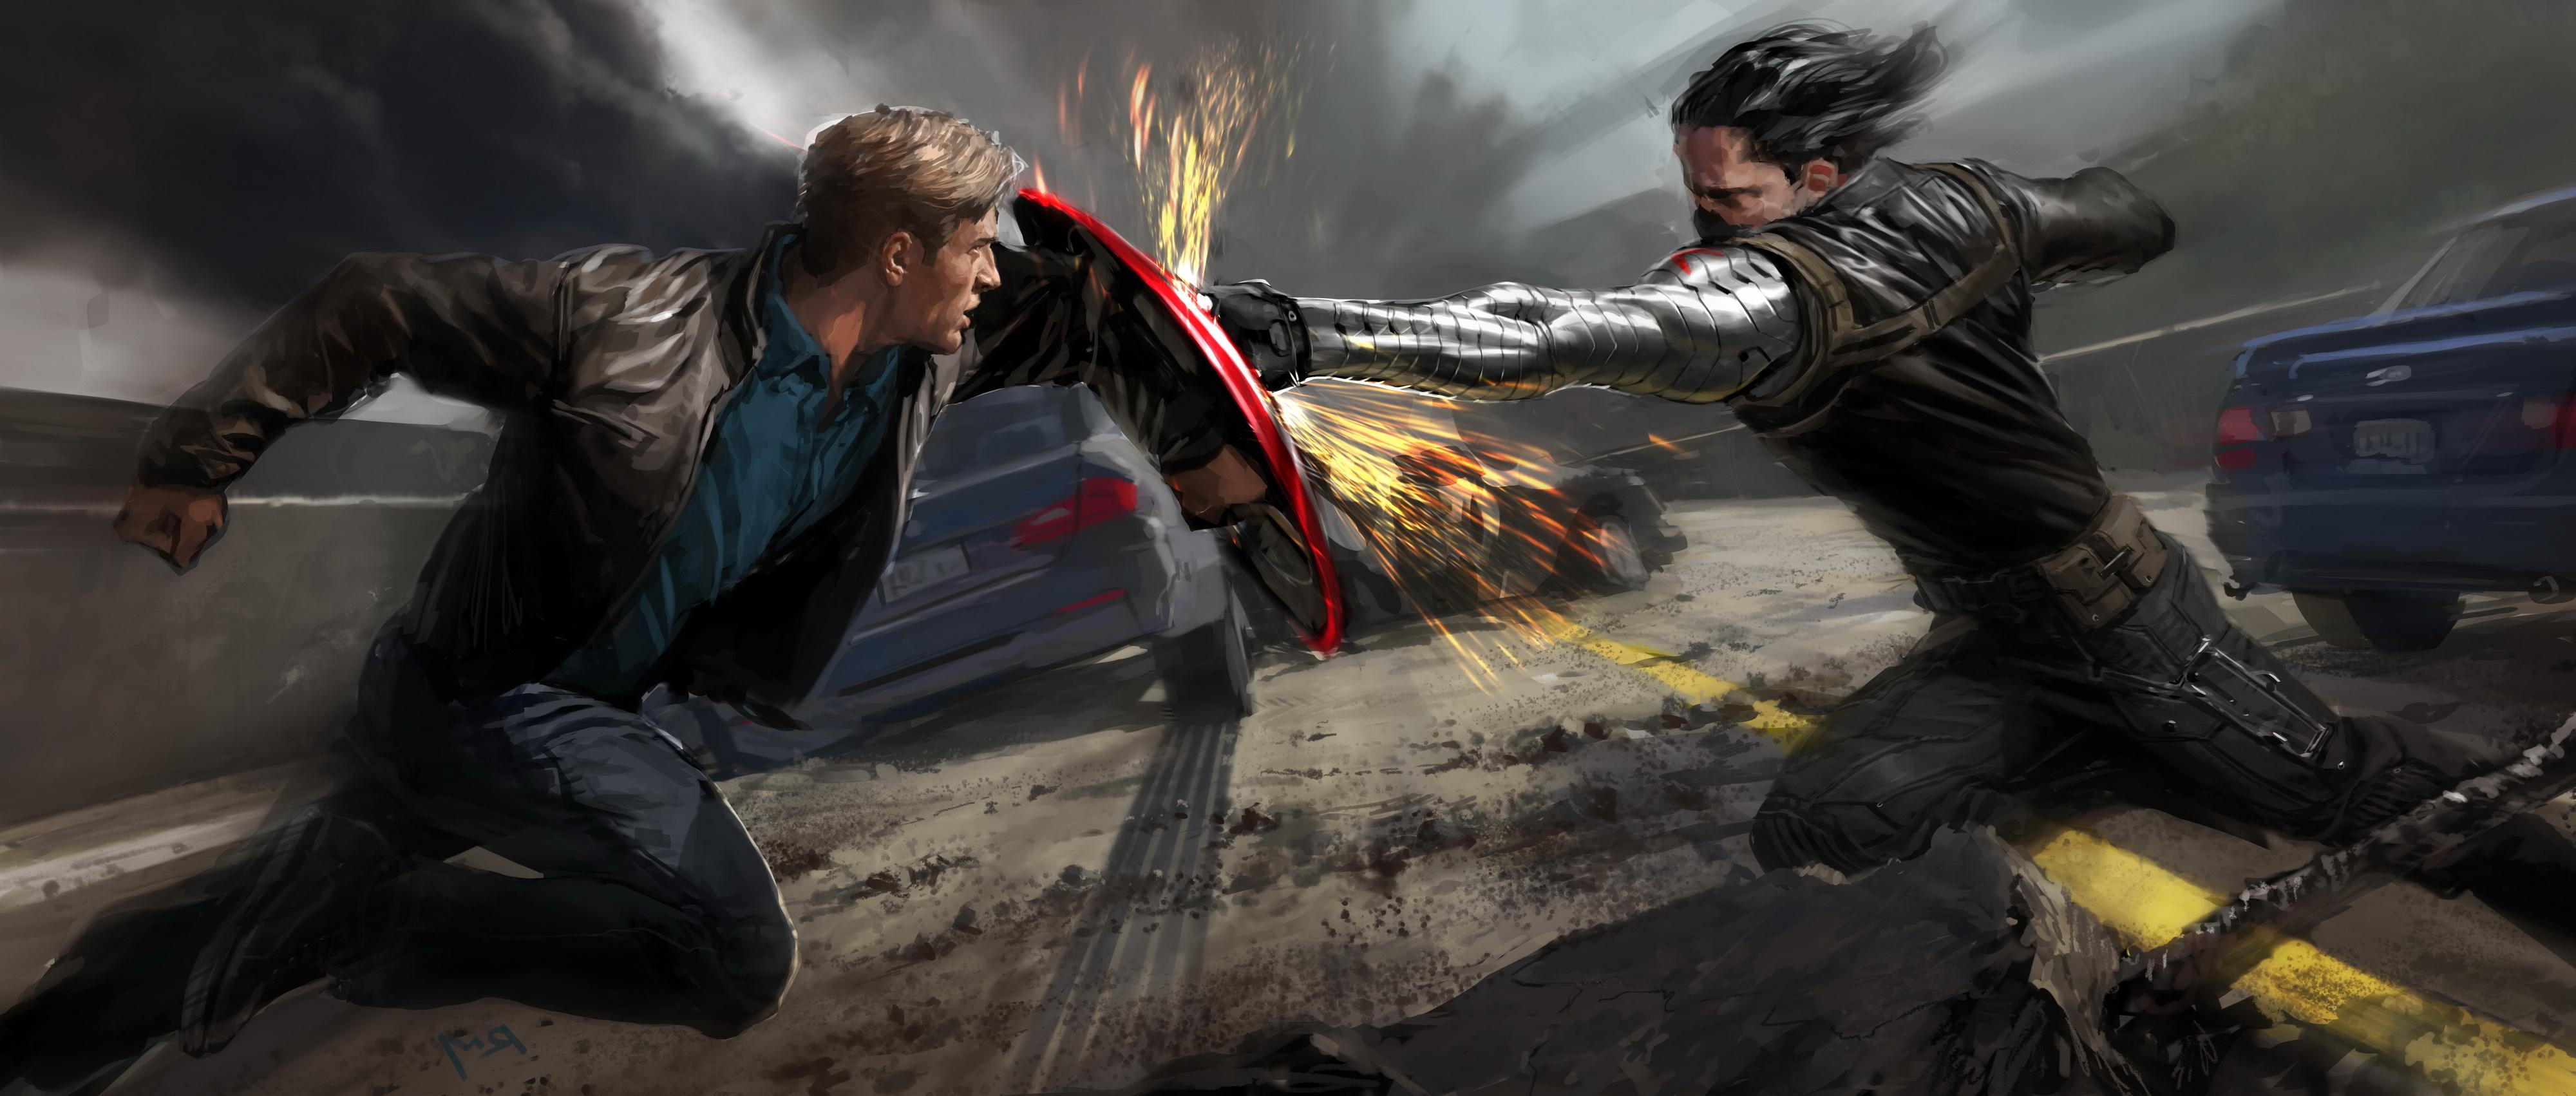 Captain America: The Winter Soldier HD Wallpaper ...